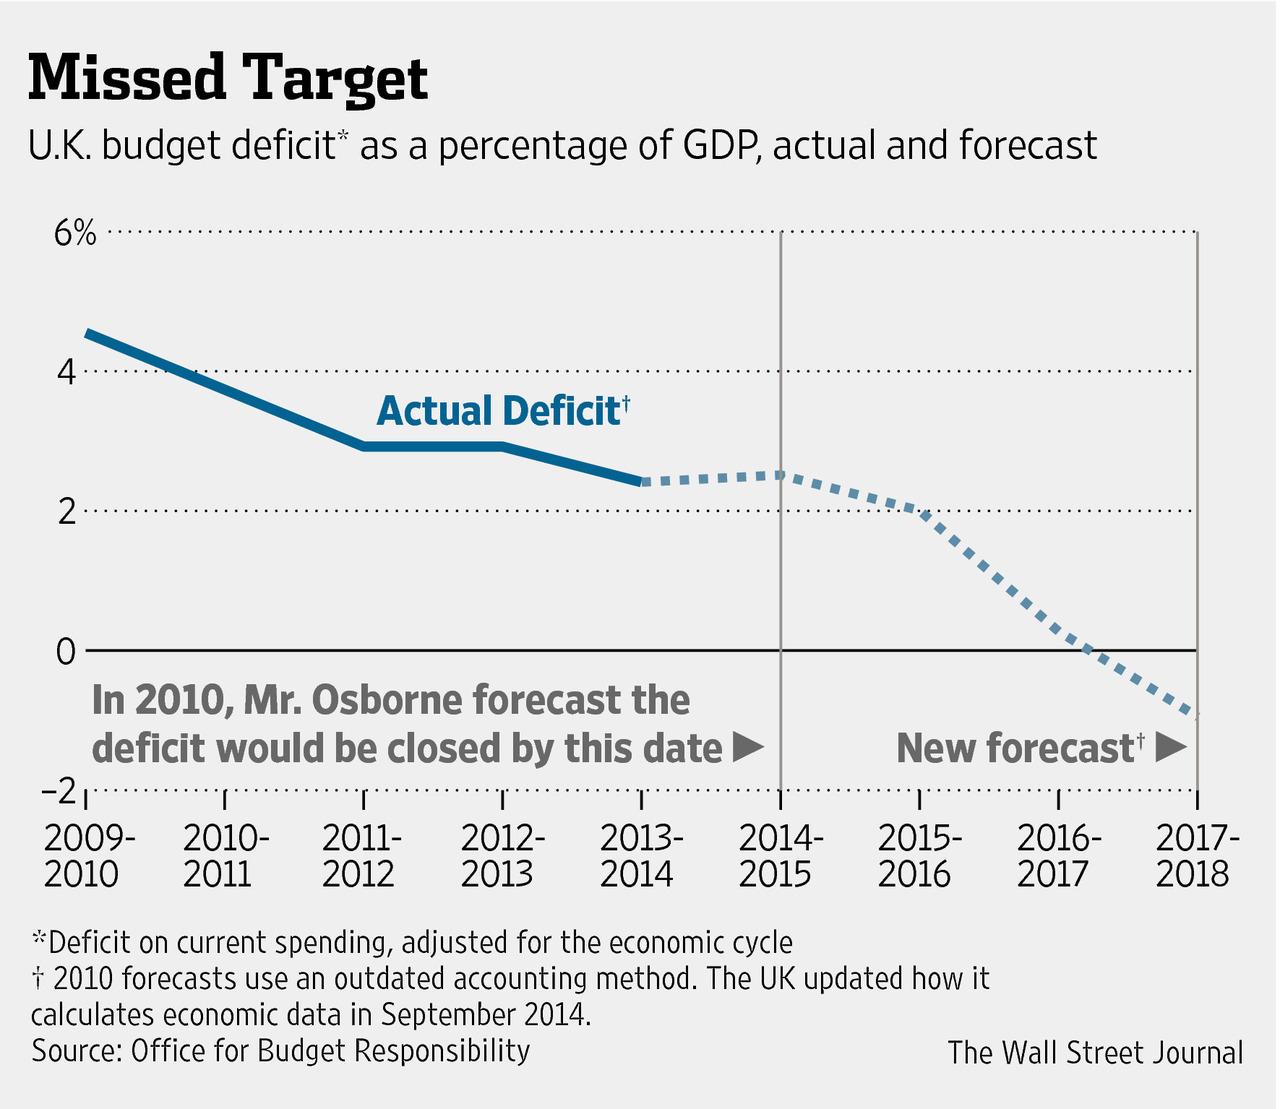 Обзор: Президент ФРС Далласа Ричард Фишер: сокращение баланса не причинит вреда